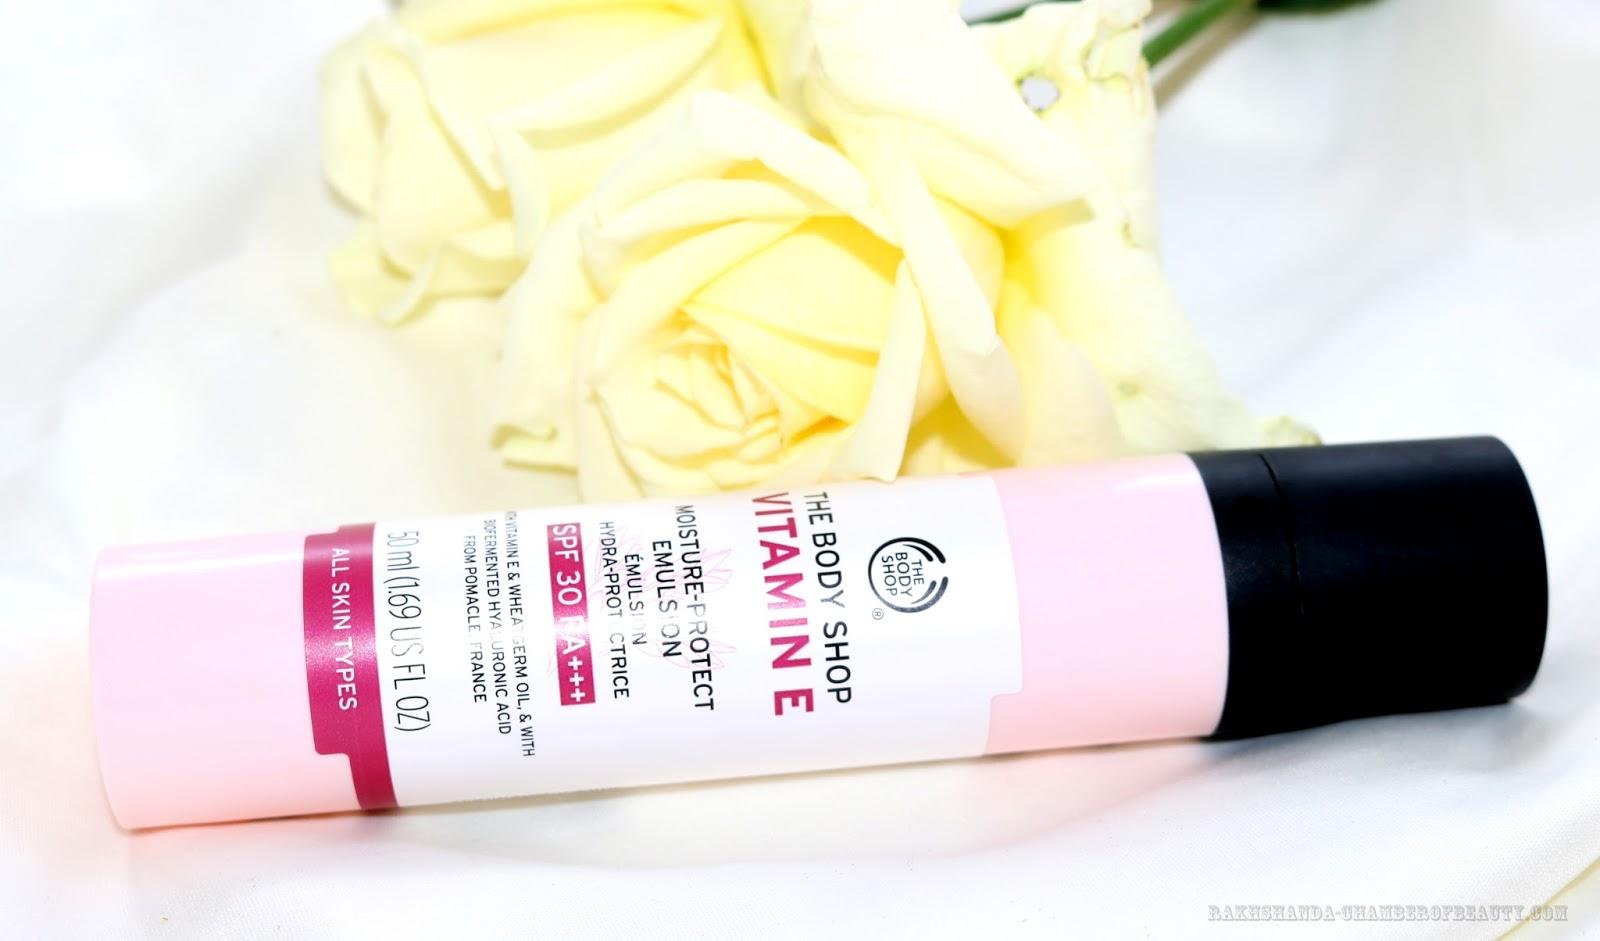 Review - The Body Shop Vitamin E Moisture-Protect Emulsion SPF30/PA+++,Indian beauty blogger, rakhshanda-chamberofbeauty.com